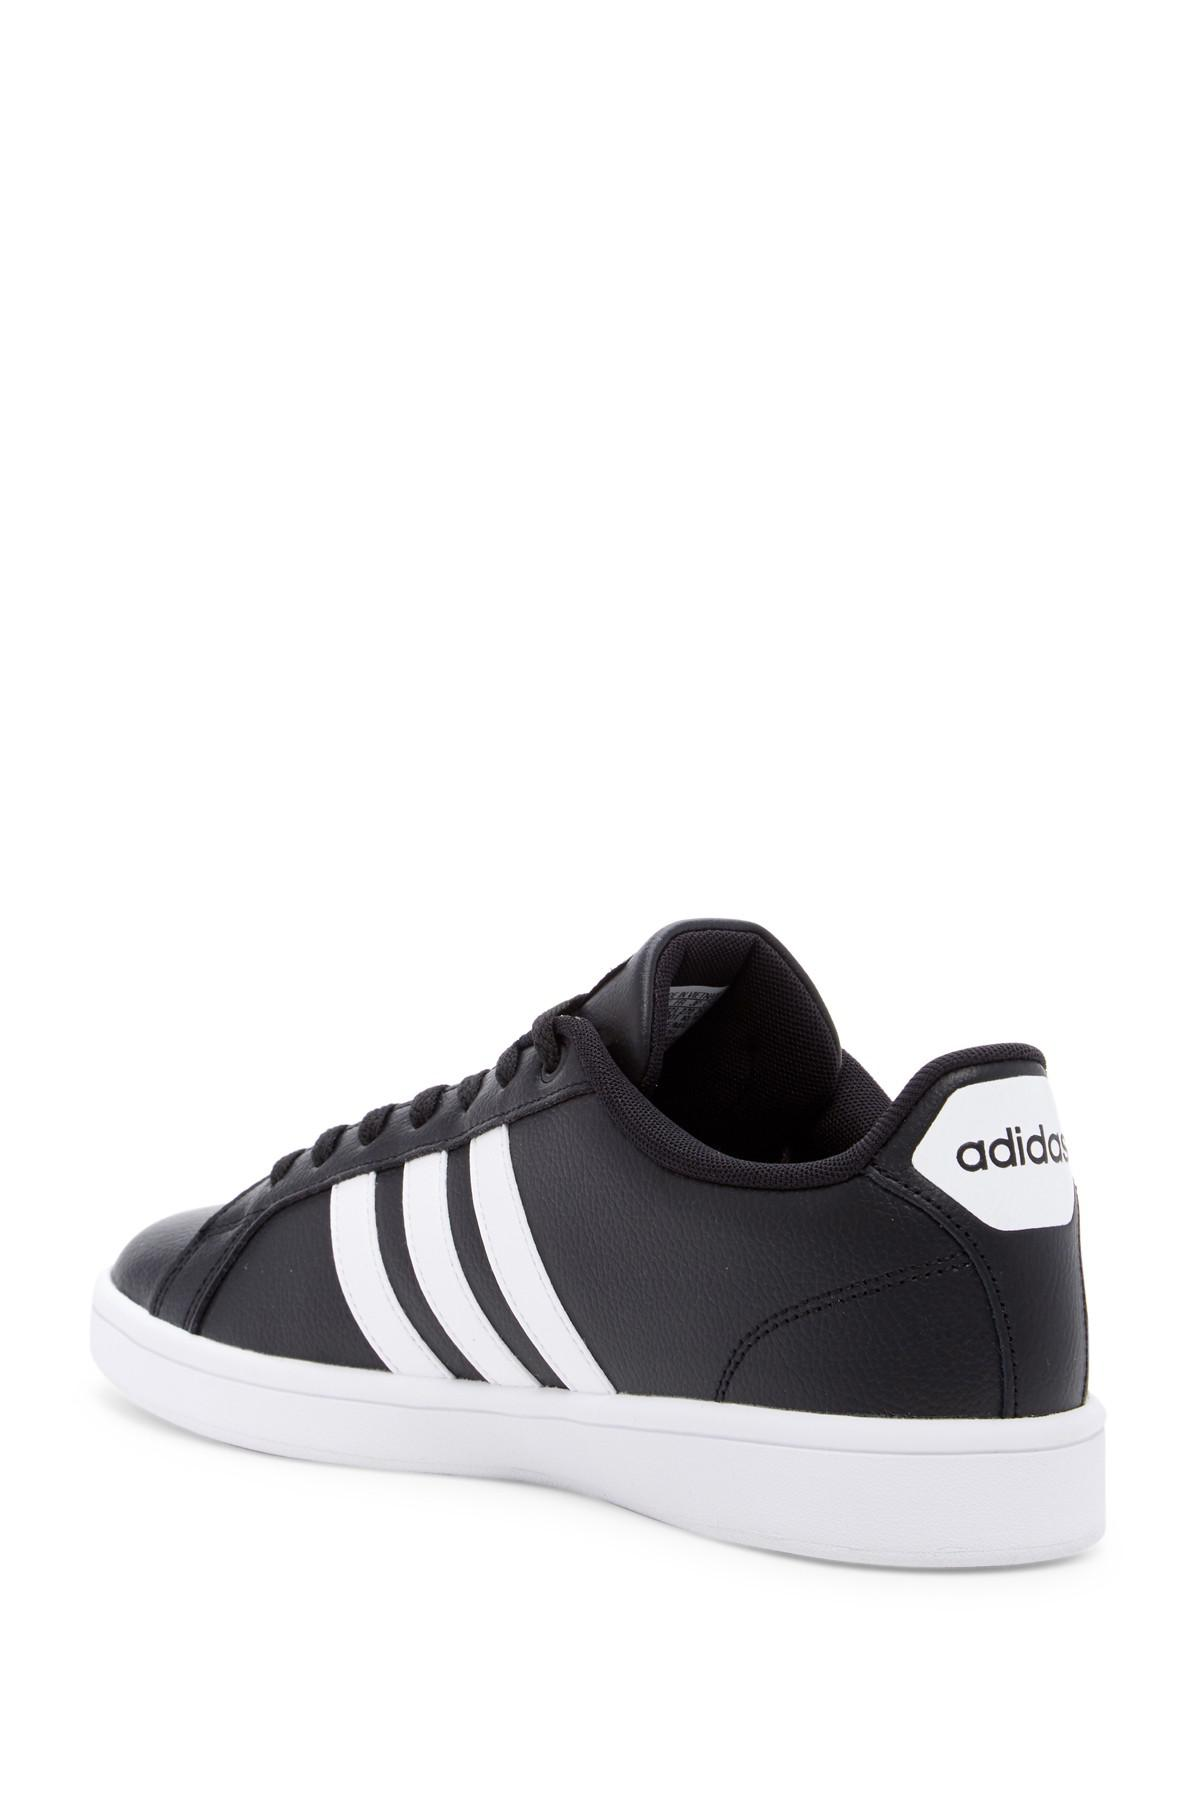 55fcaa915 Adidas - Black Cloudfoam Advantage Leather Sneaker for Men - Lyst. View  fullscreen